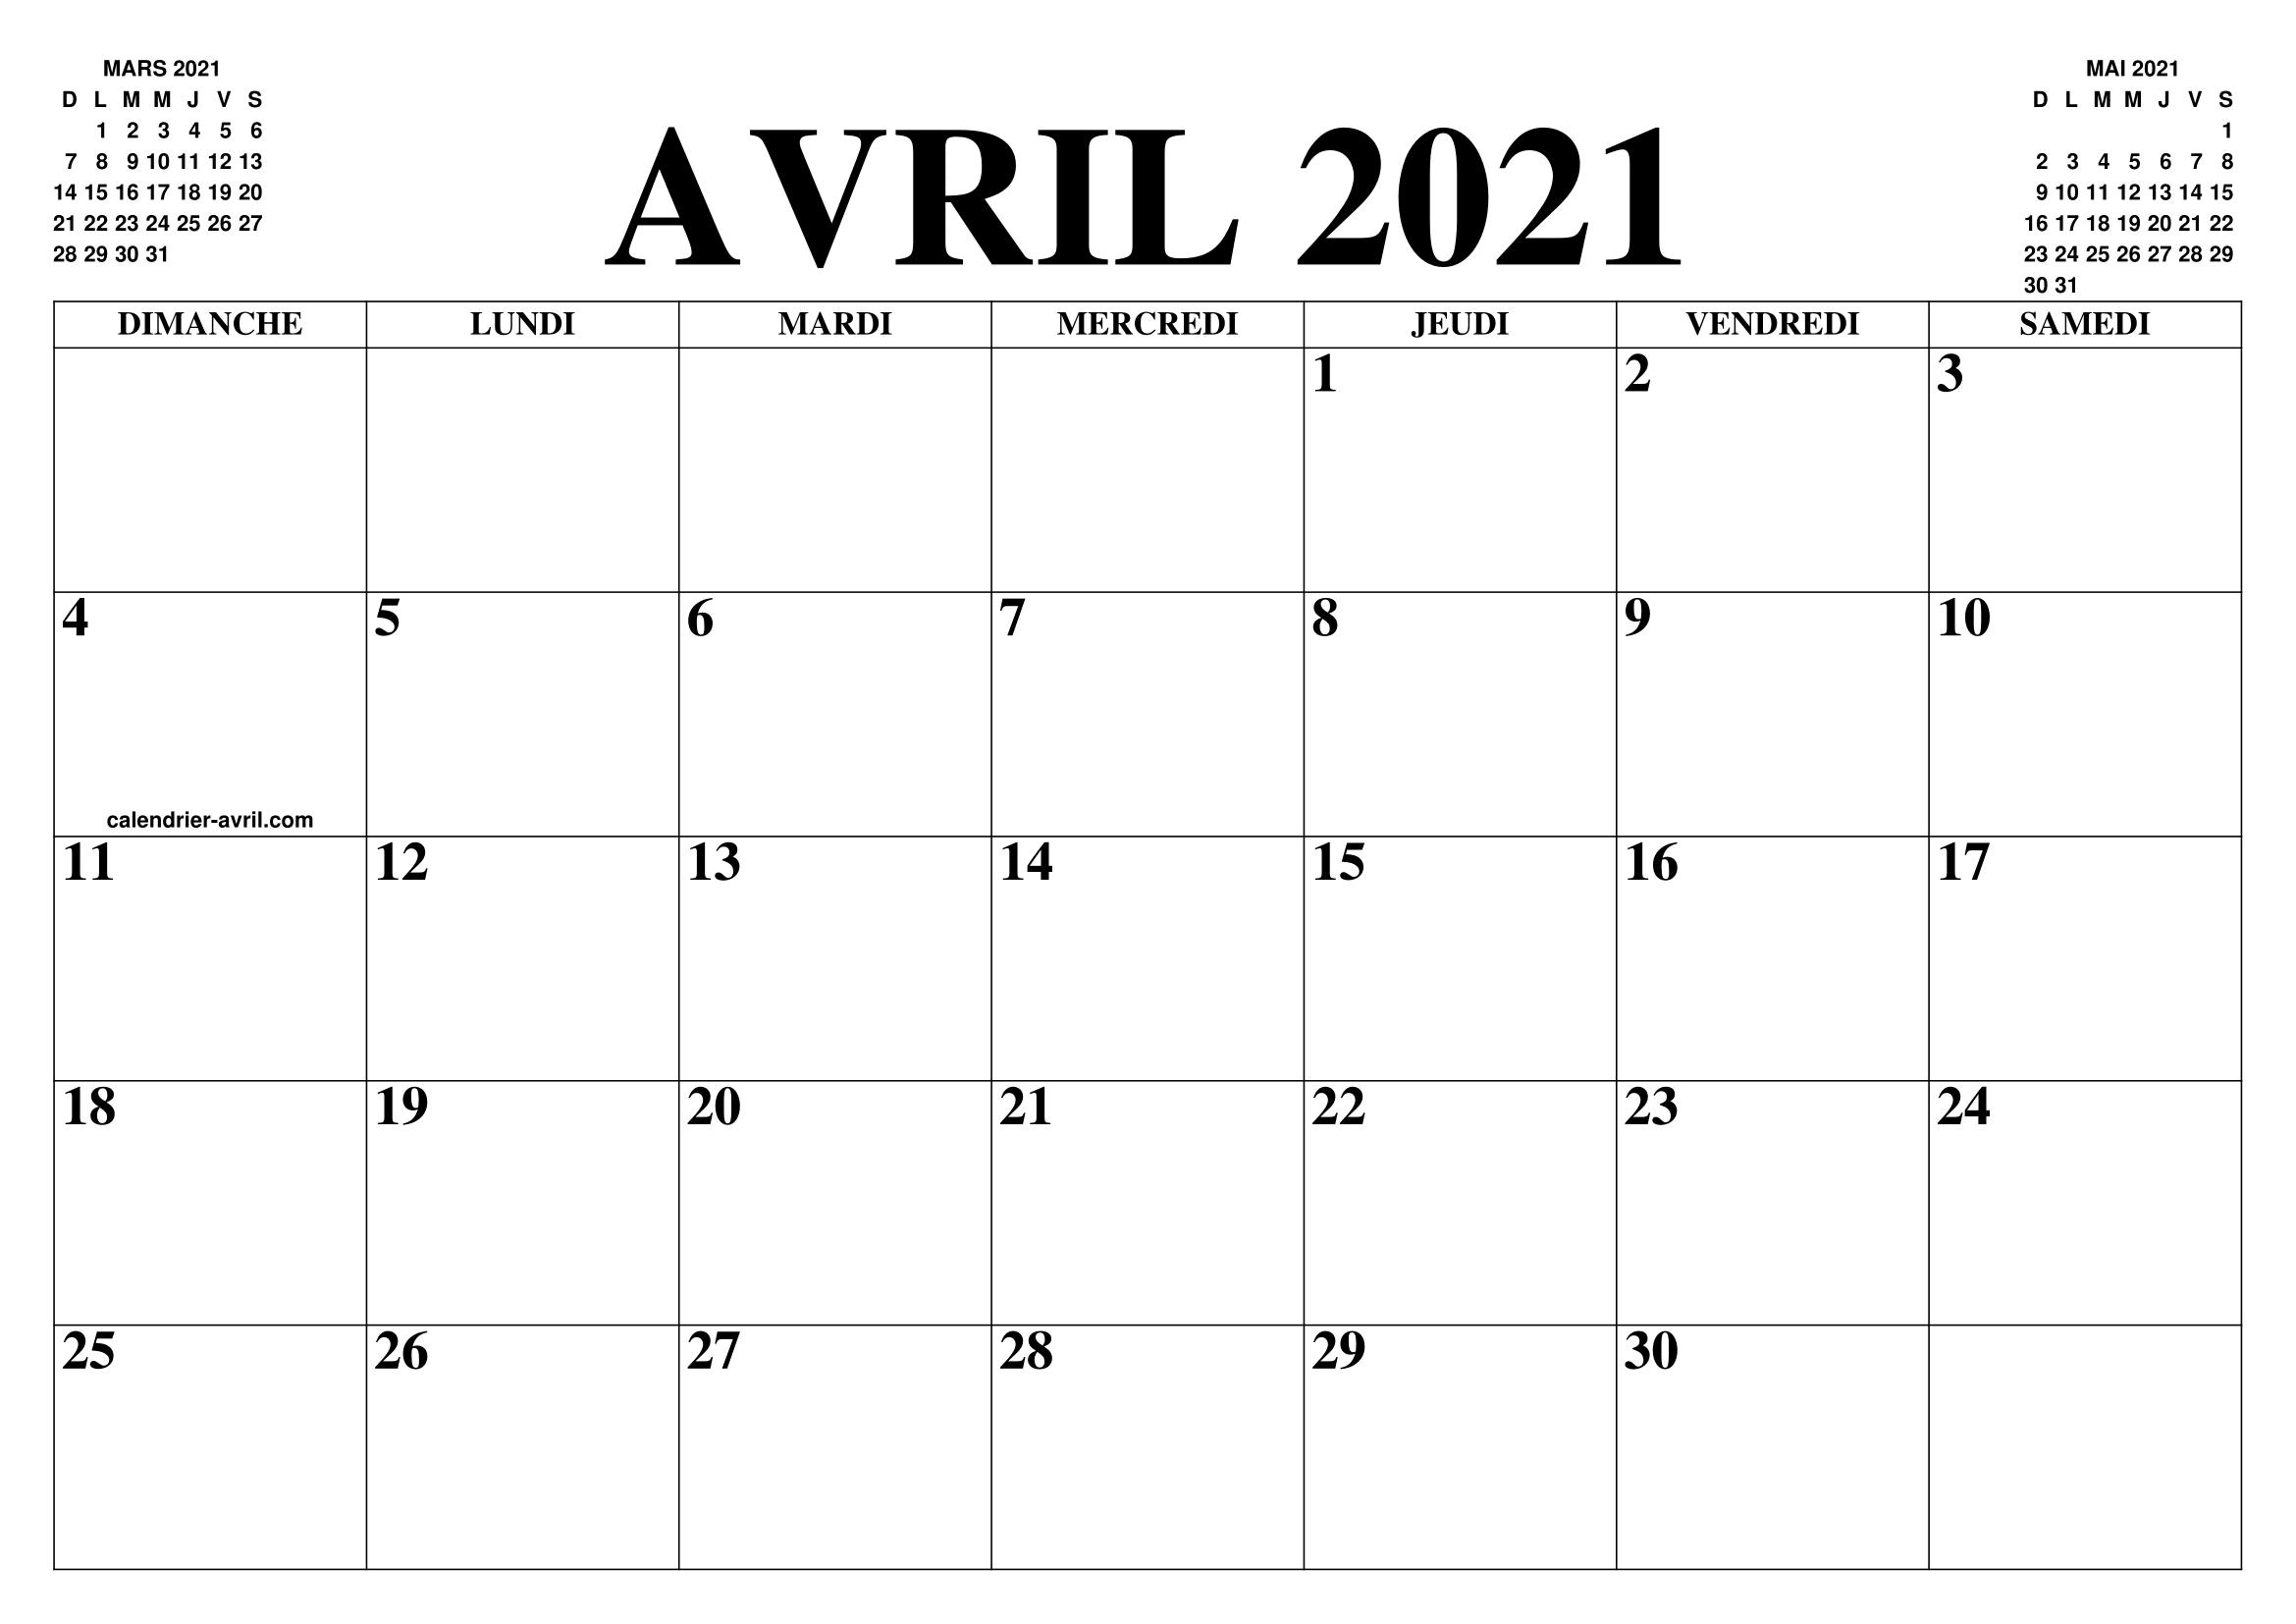 Calendrier Mensuel Avril 2021 CALENDRIER AVRIL 2021 : LE CALENDRIER DU MOIS DE AVRIL GRATUIT A